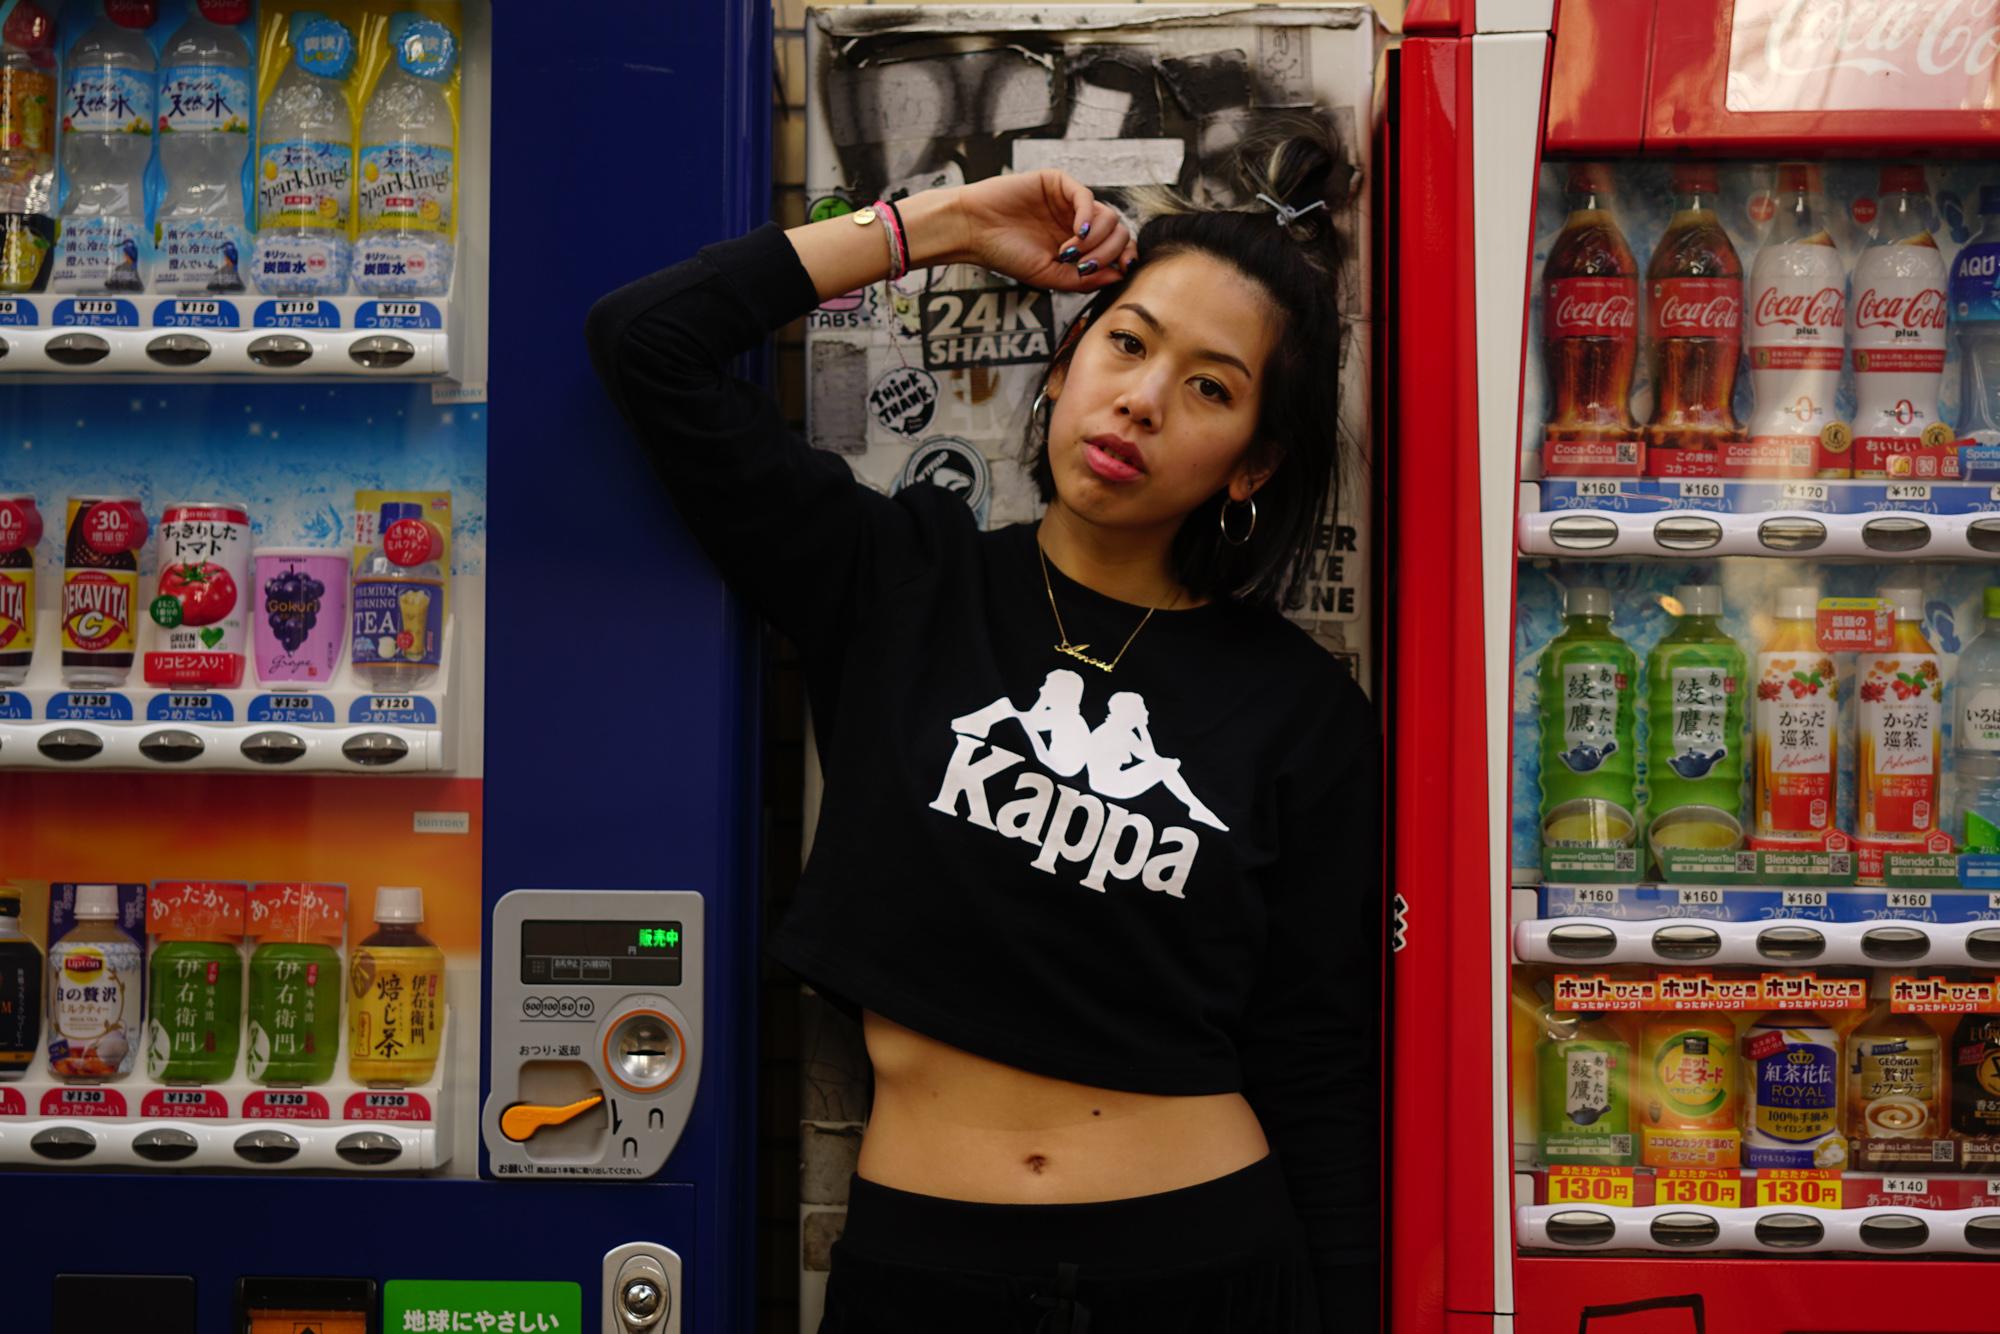 Kappa x Candy Rosie 2